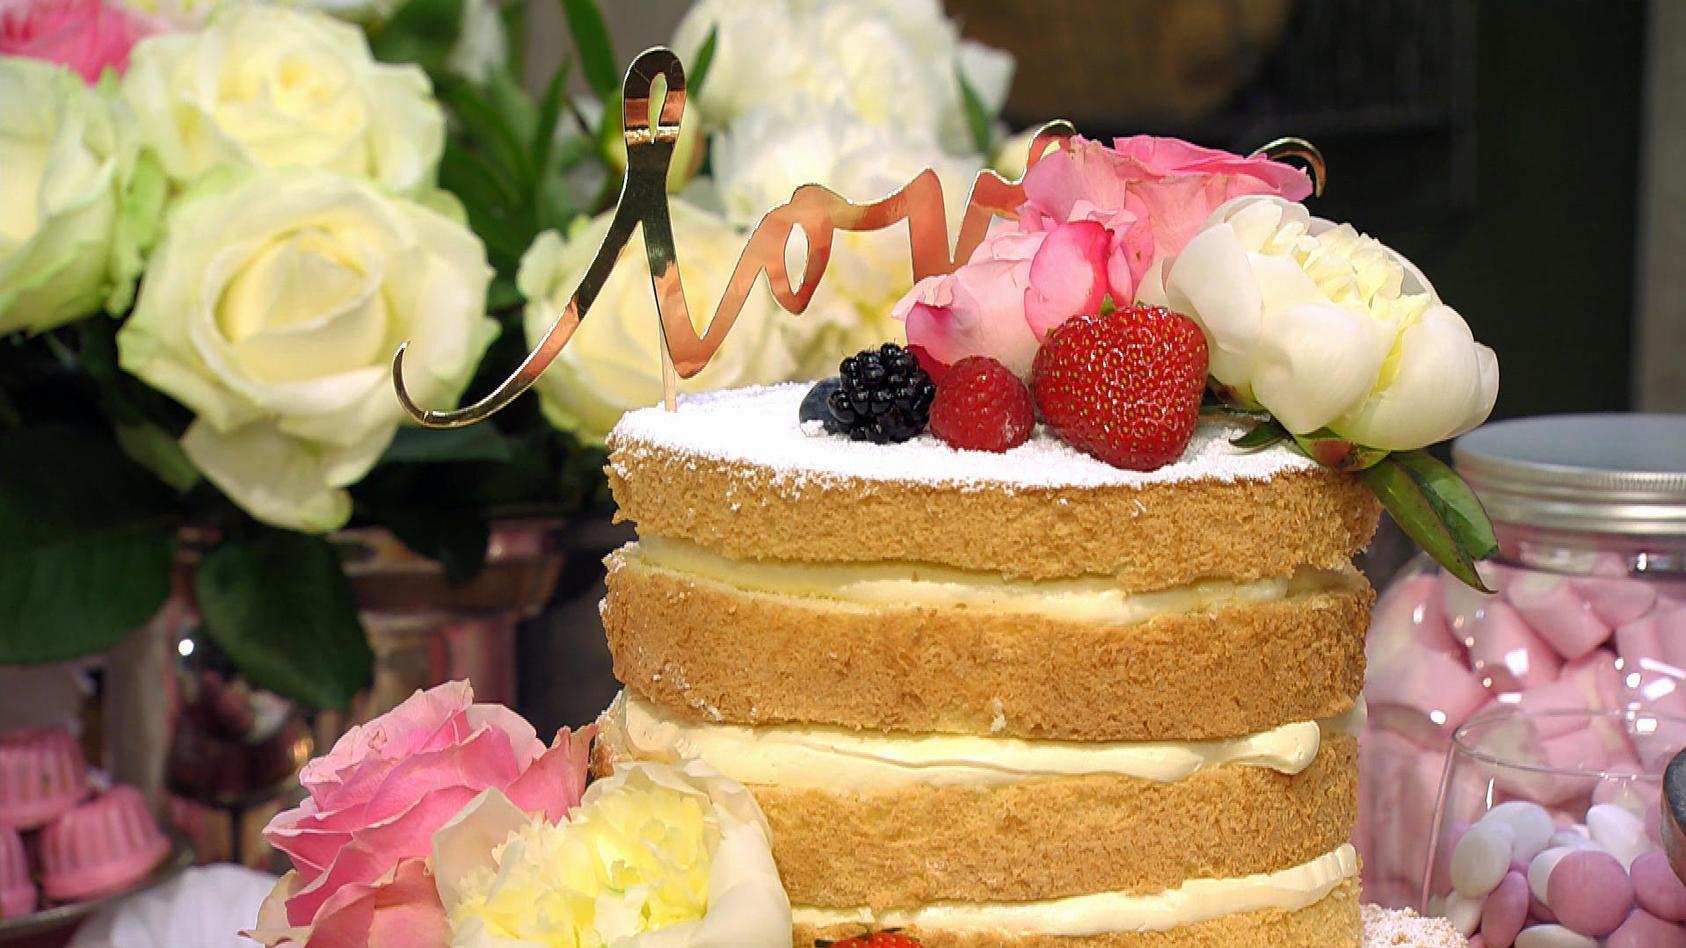 Sweet Table – das zuckersüße Buffet für den besonderen Anlass: Naked Cake